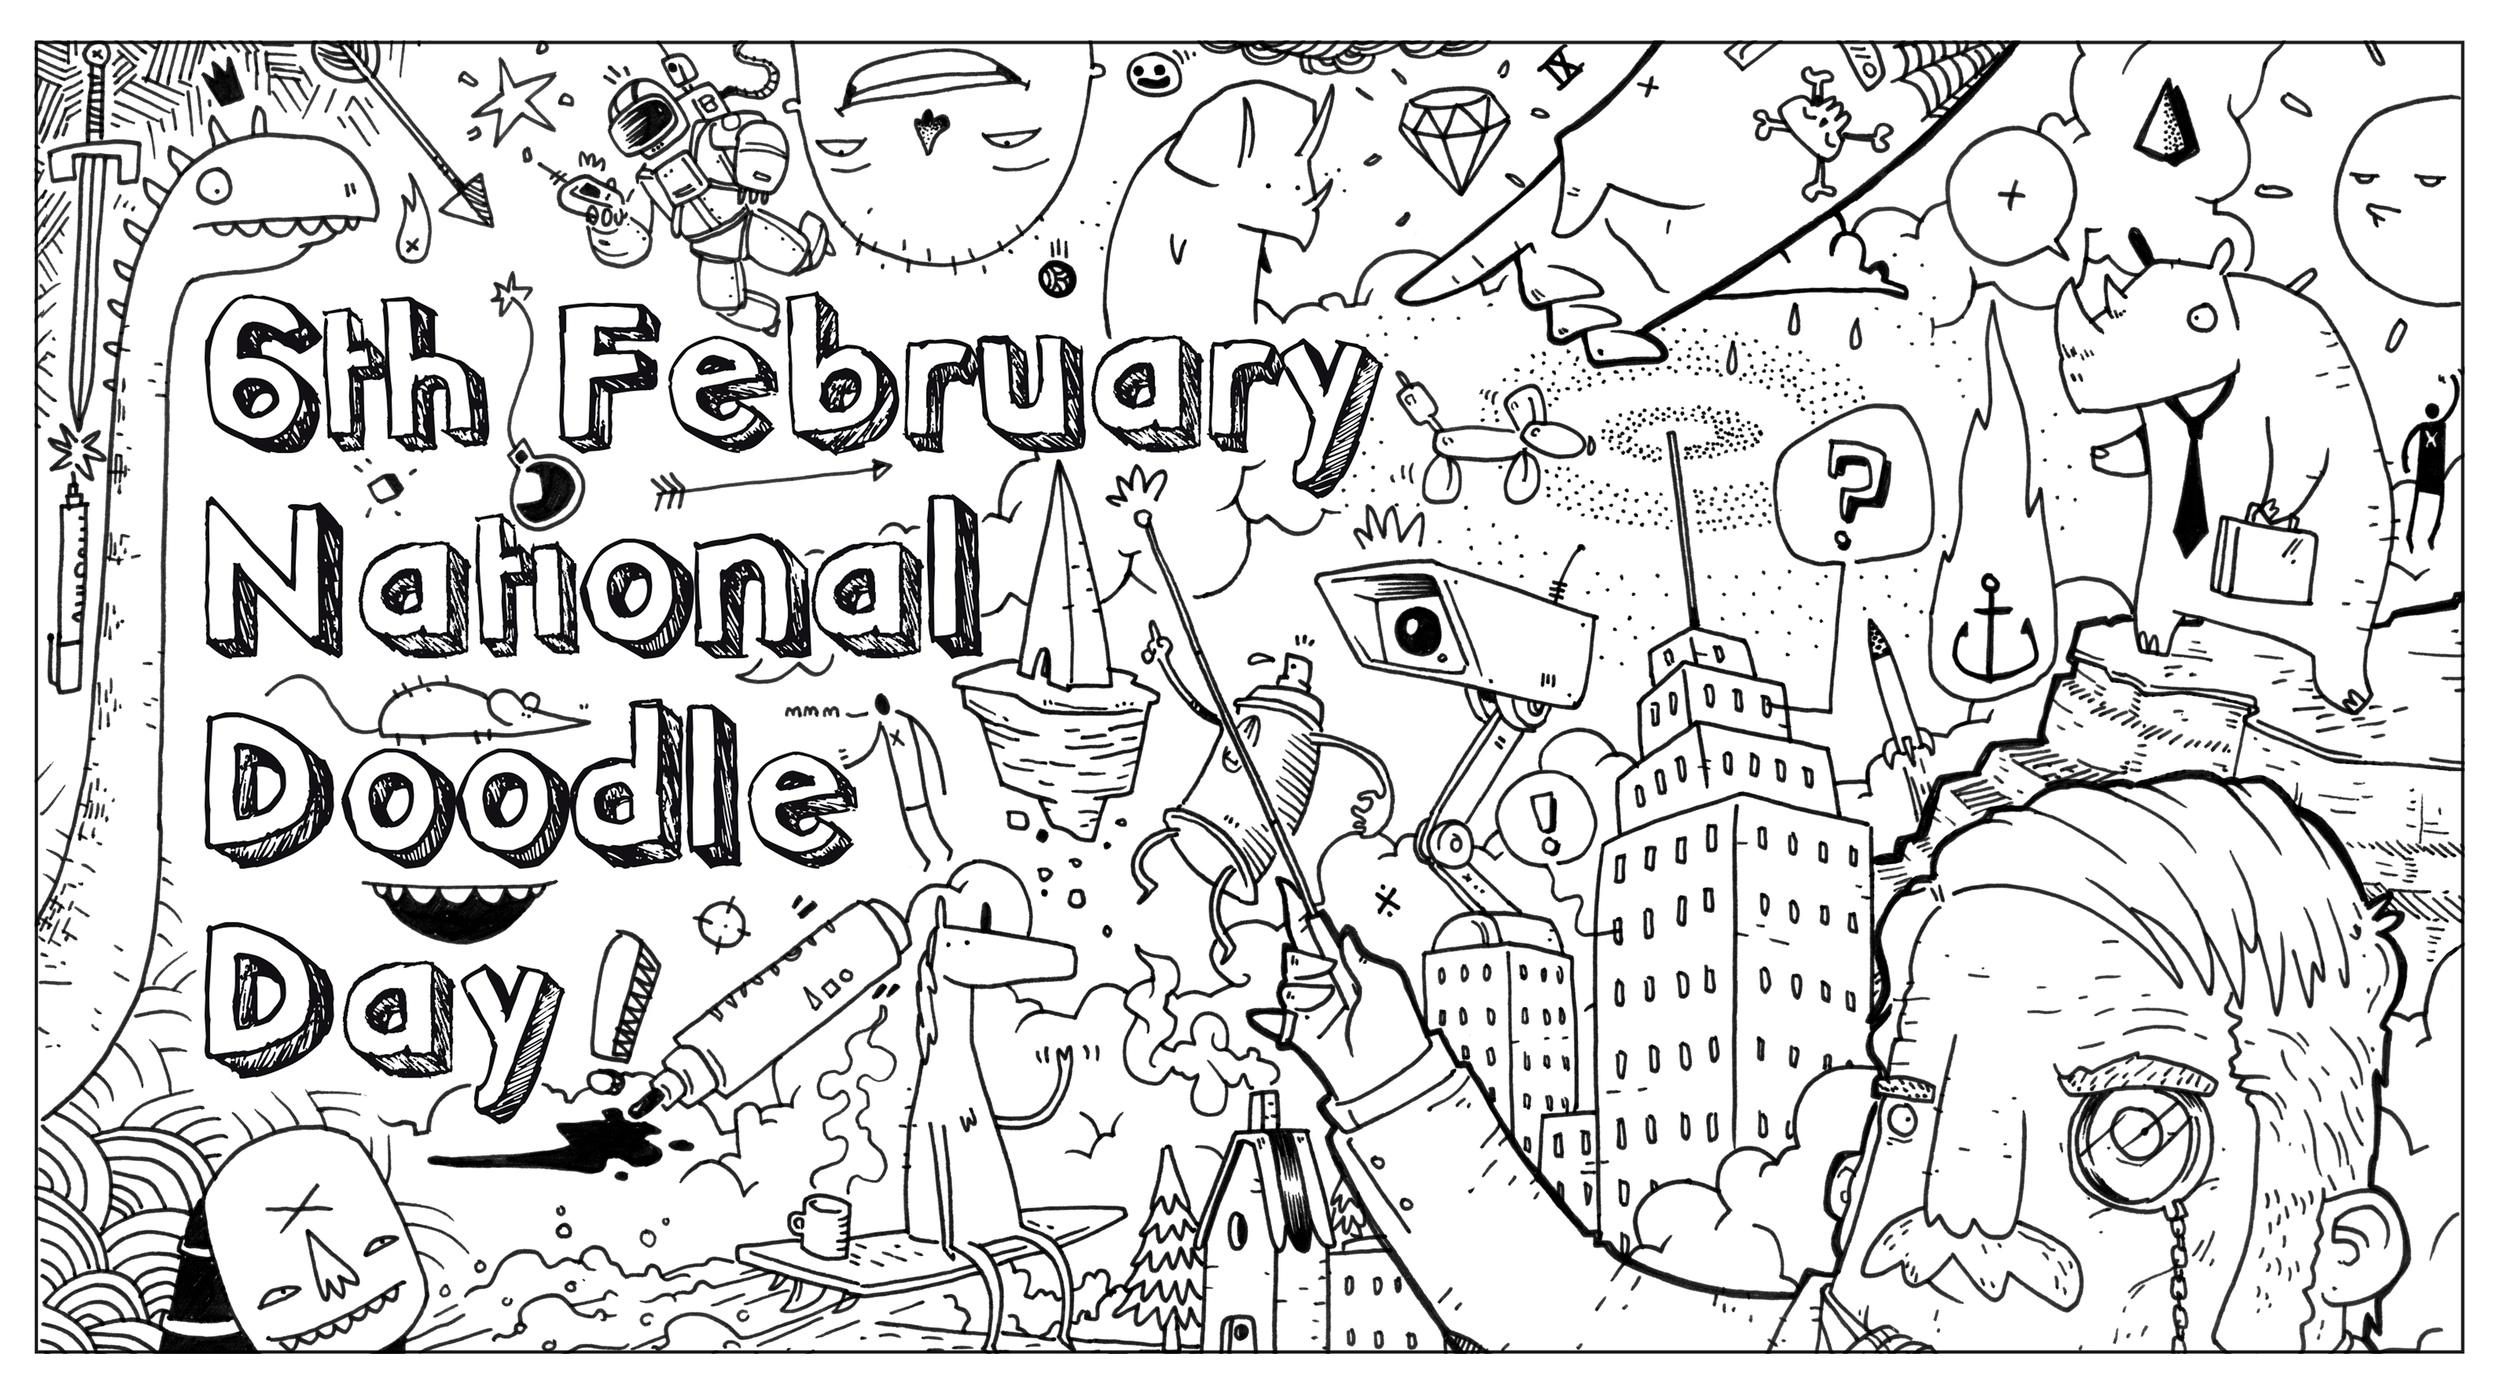 doodle day banner.jpg